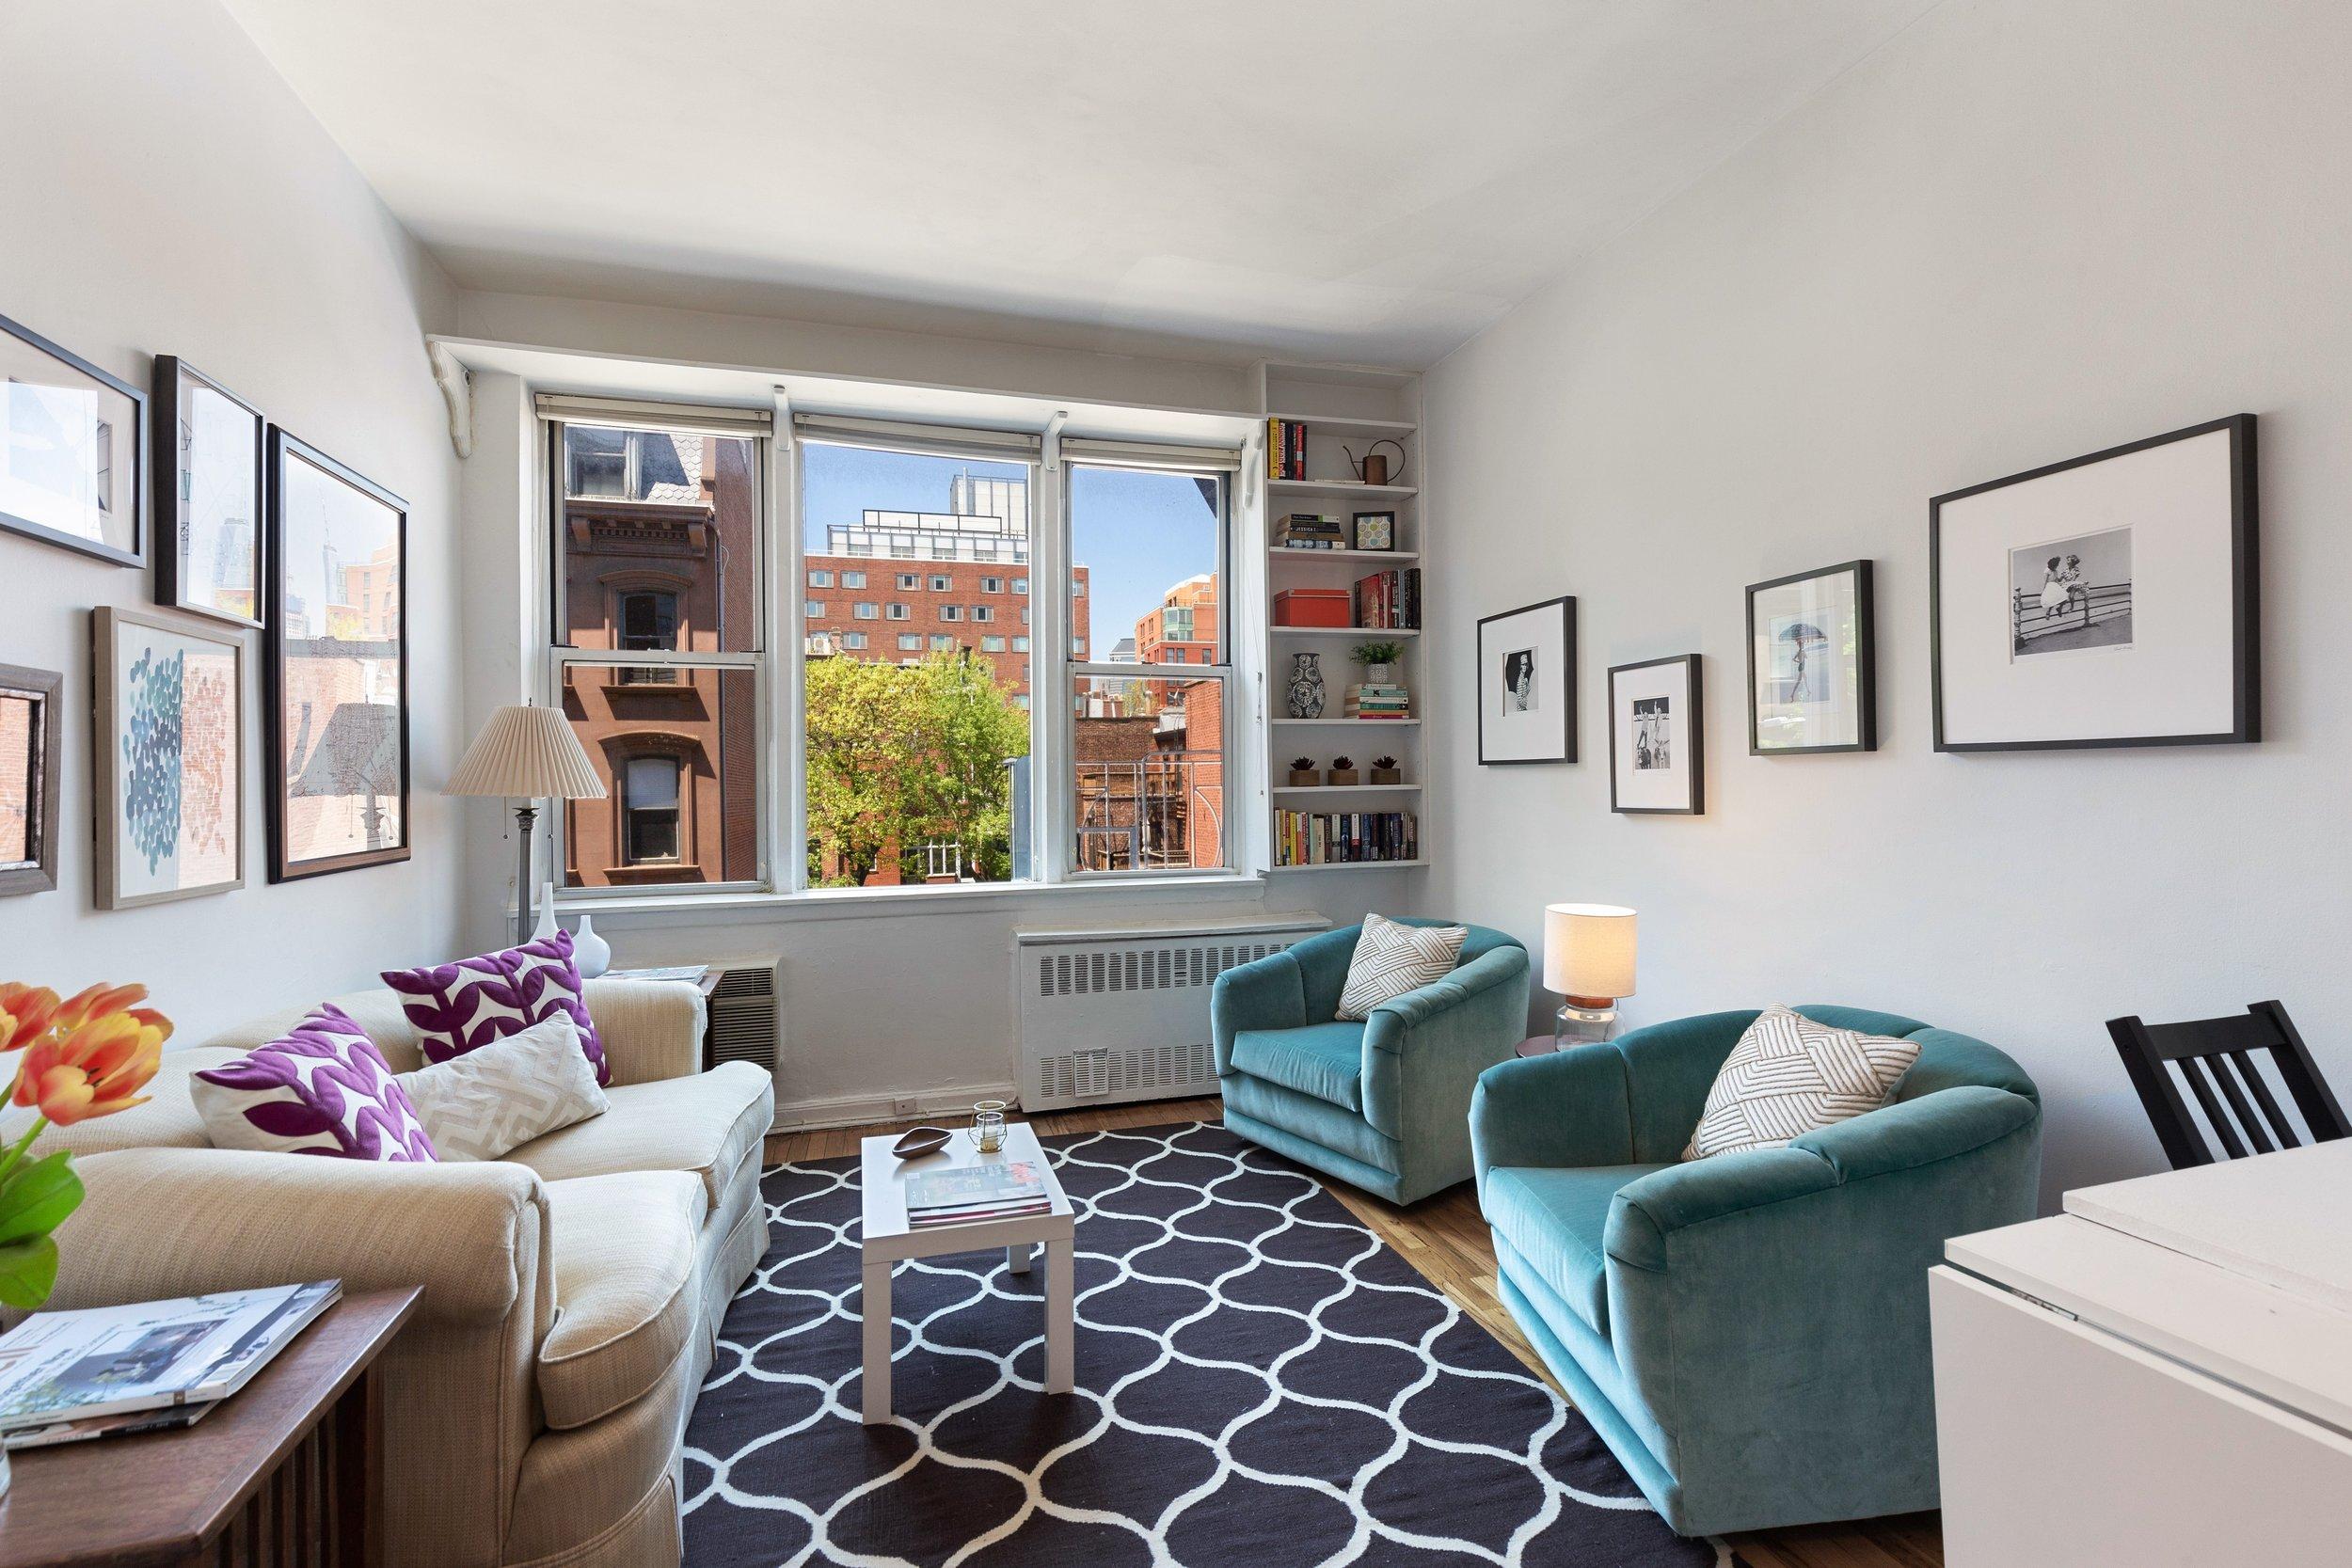 87 Hicks Street - Apt. 2D, Brooklyn Heights, bk